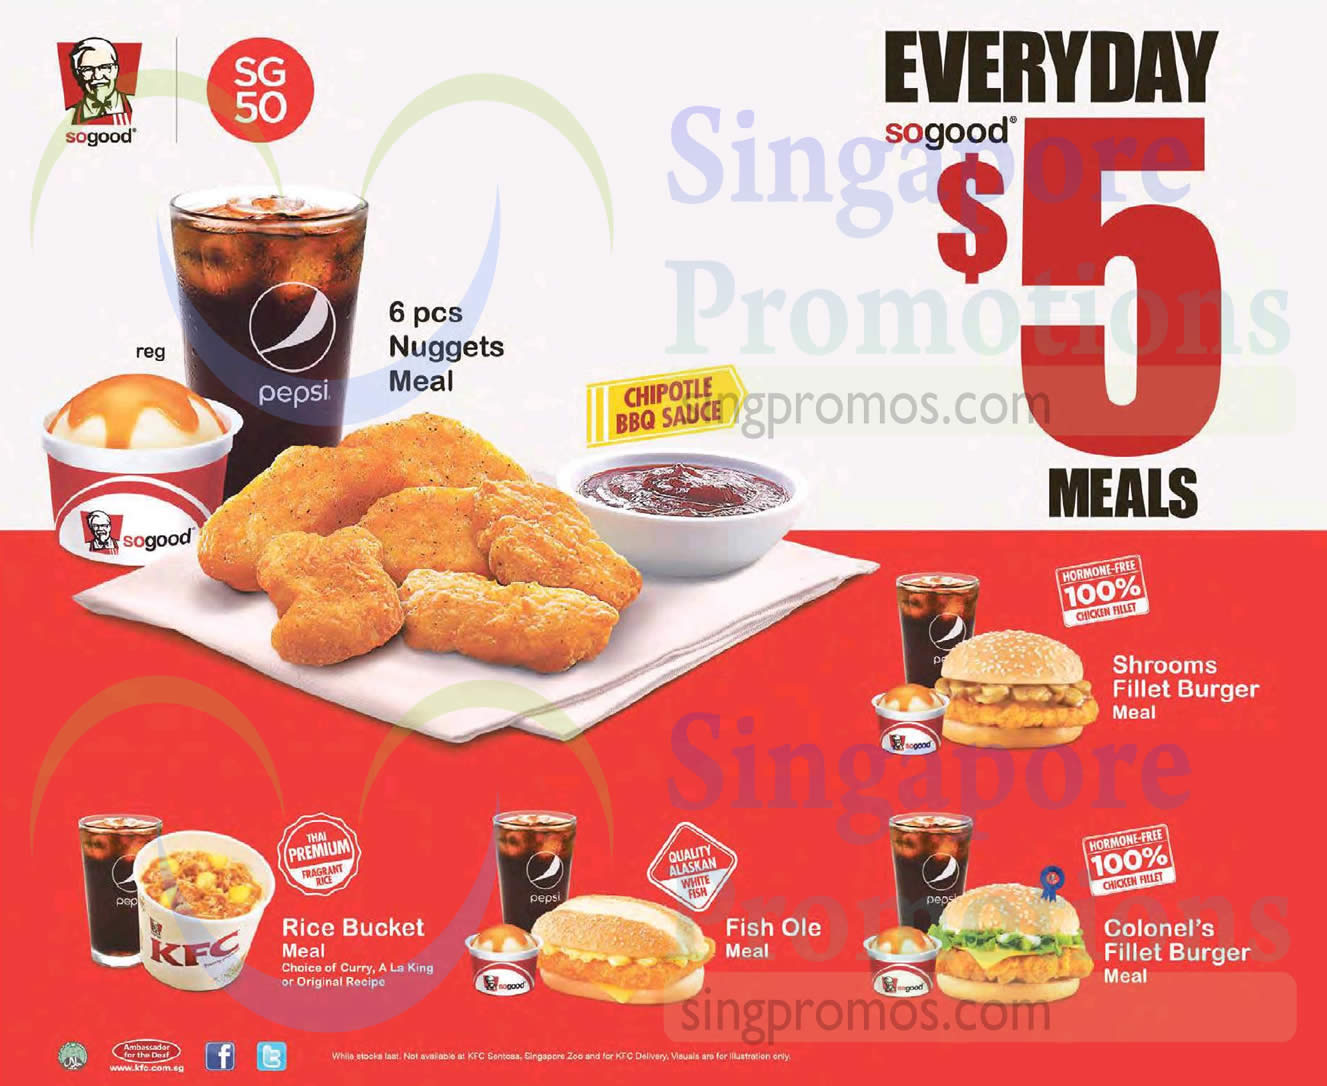 27 Apr 6 pcs Nuggets Meal